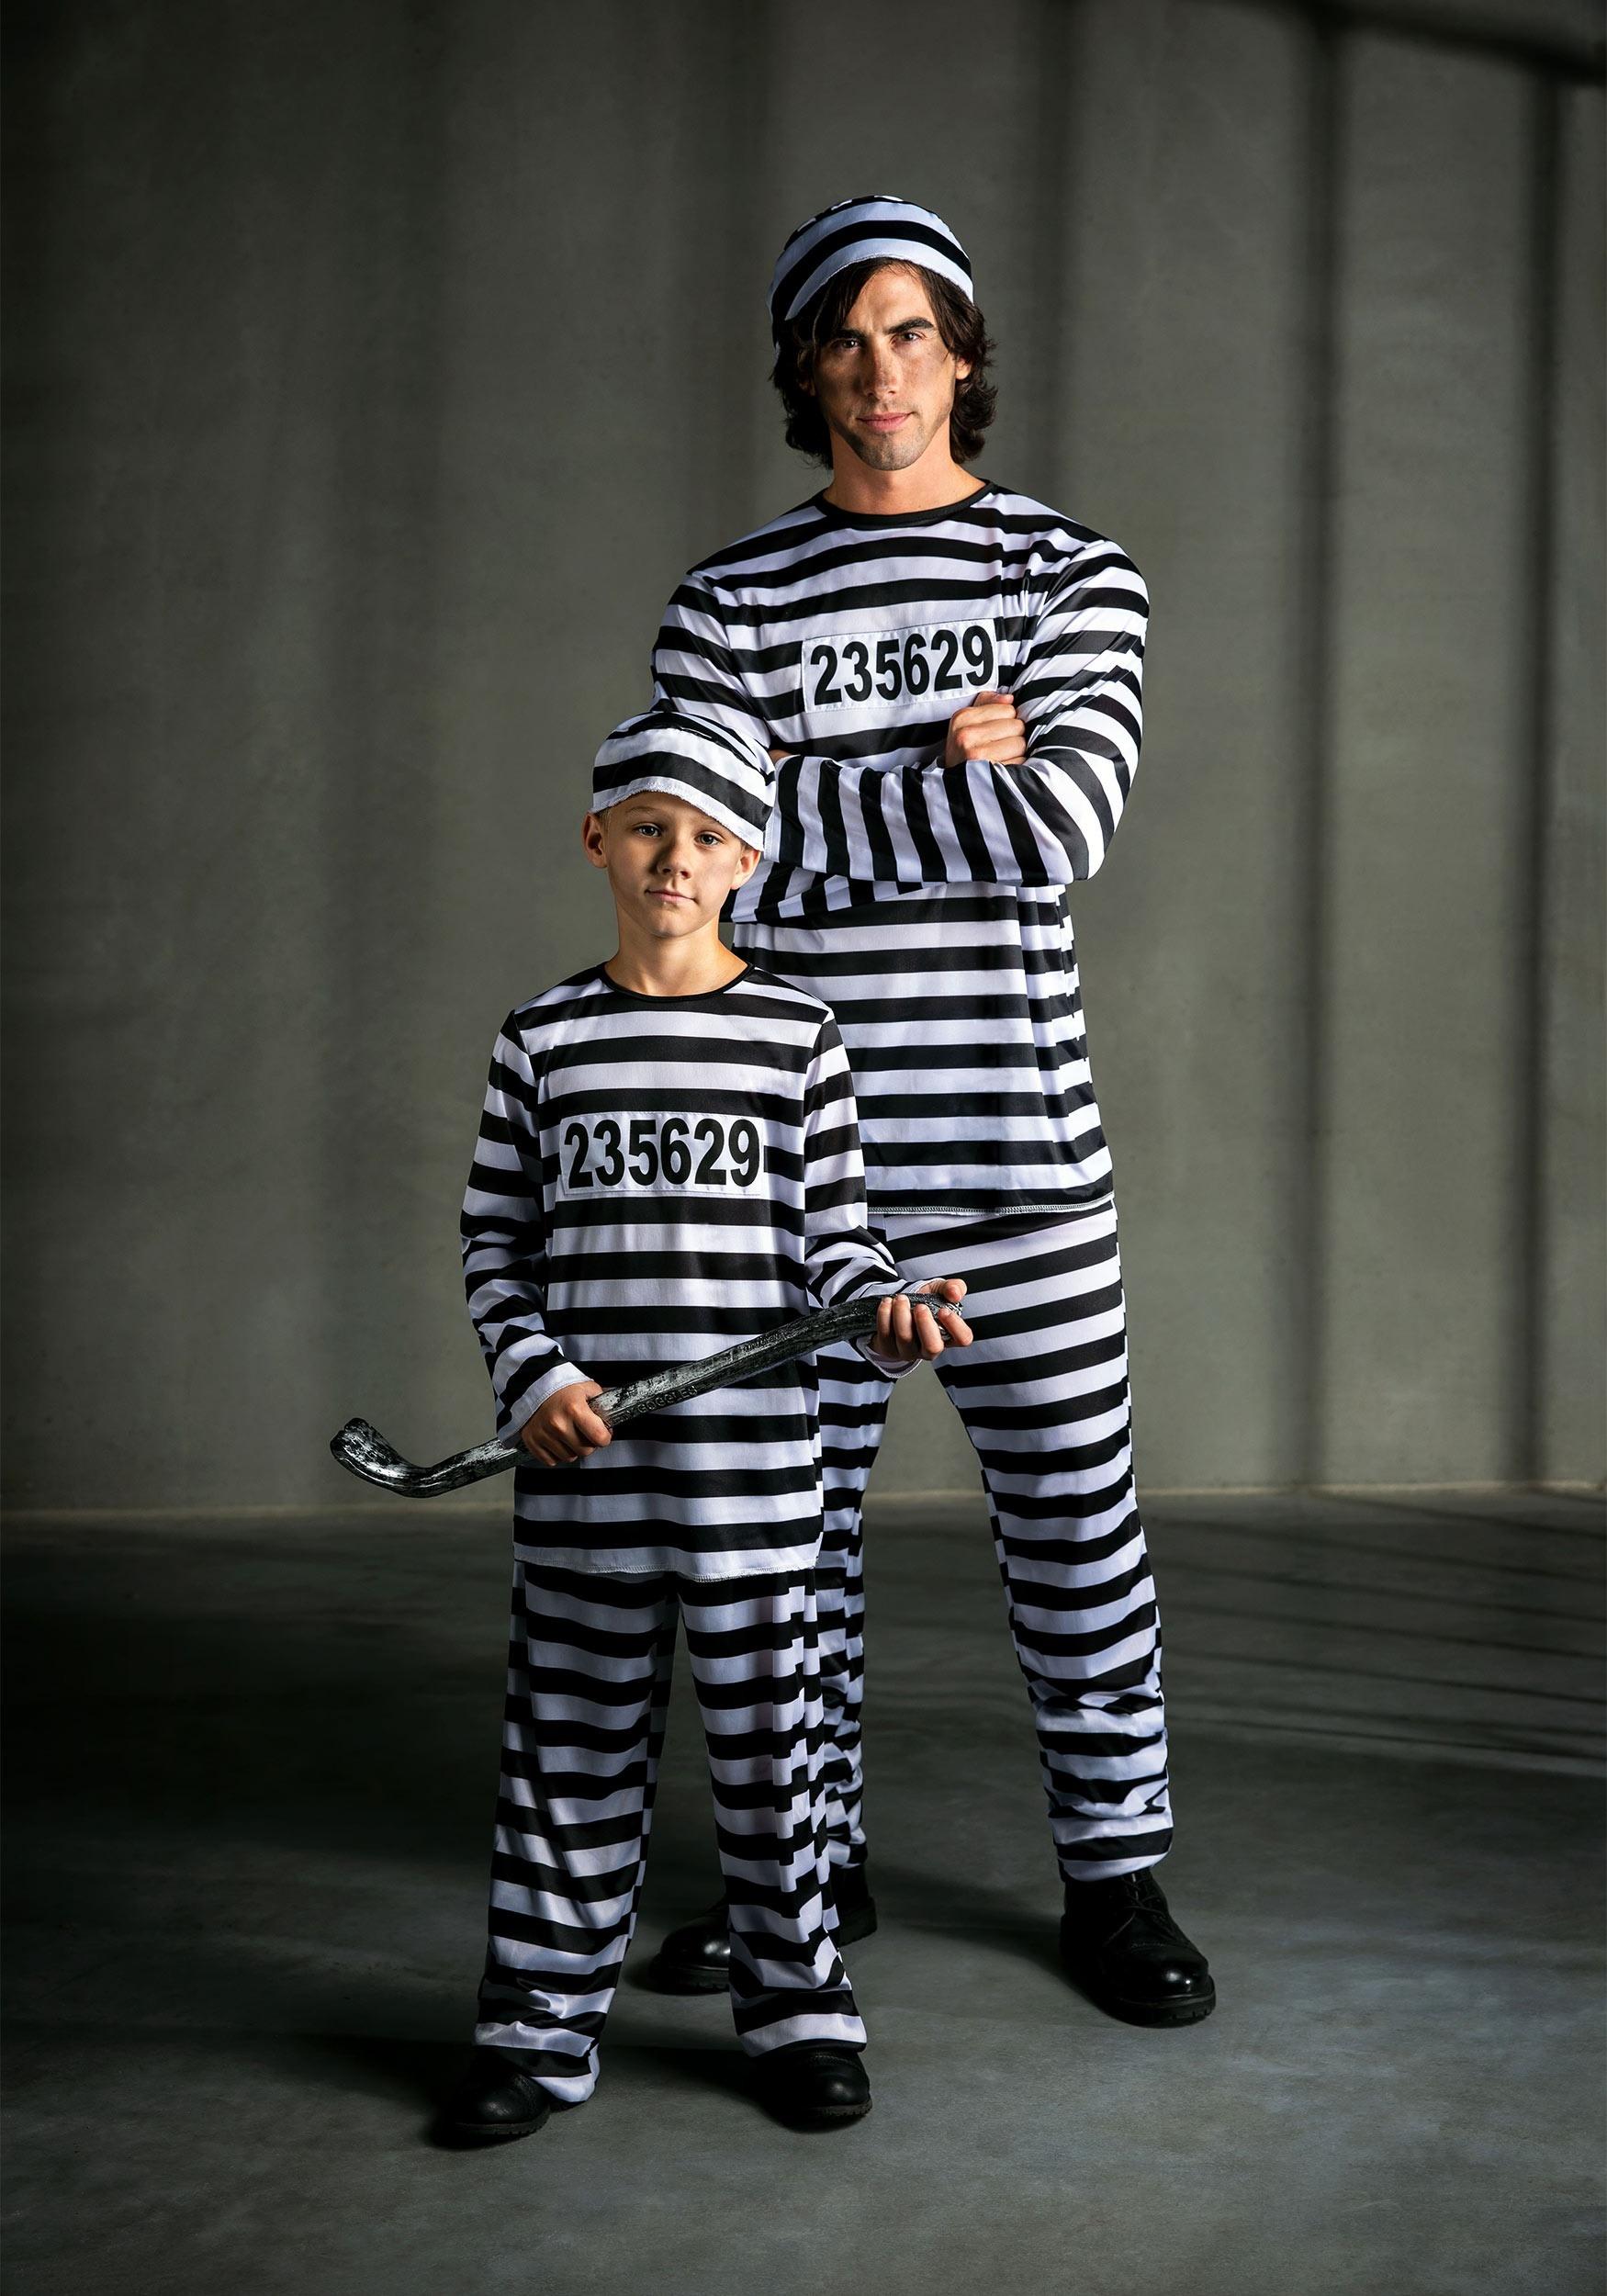 Women Striped Shirts